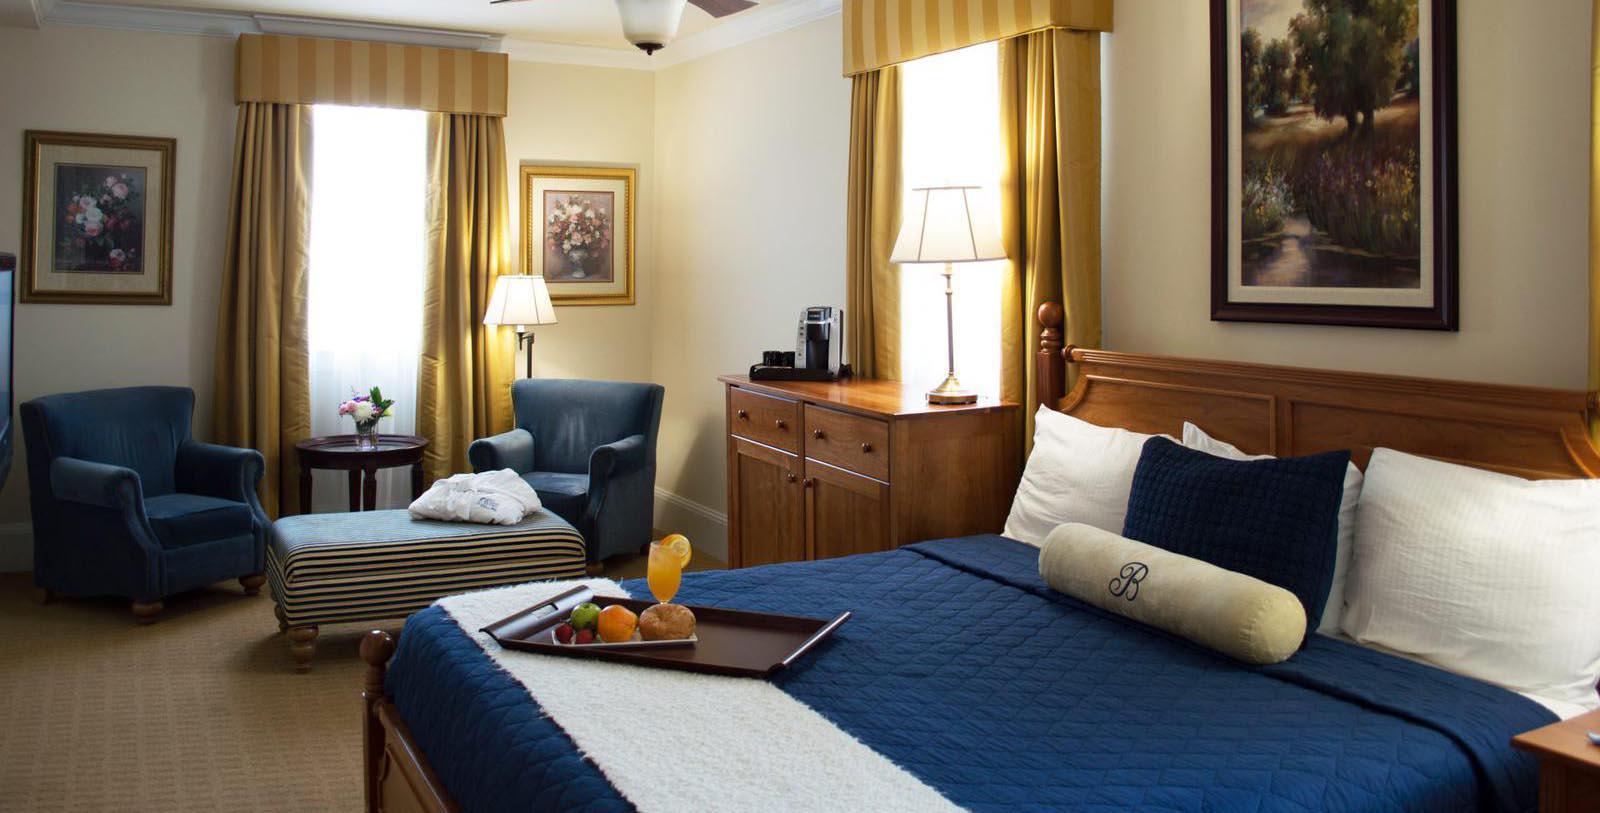 Image of Guestroom in Boone Tavern Hotel of Berea College, 1909, Member of Historic Hotels of America, in Berea, Kentucky, Hot Deals